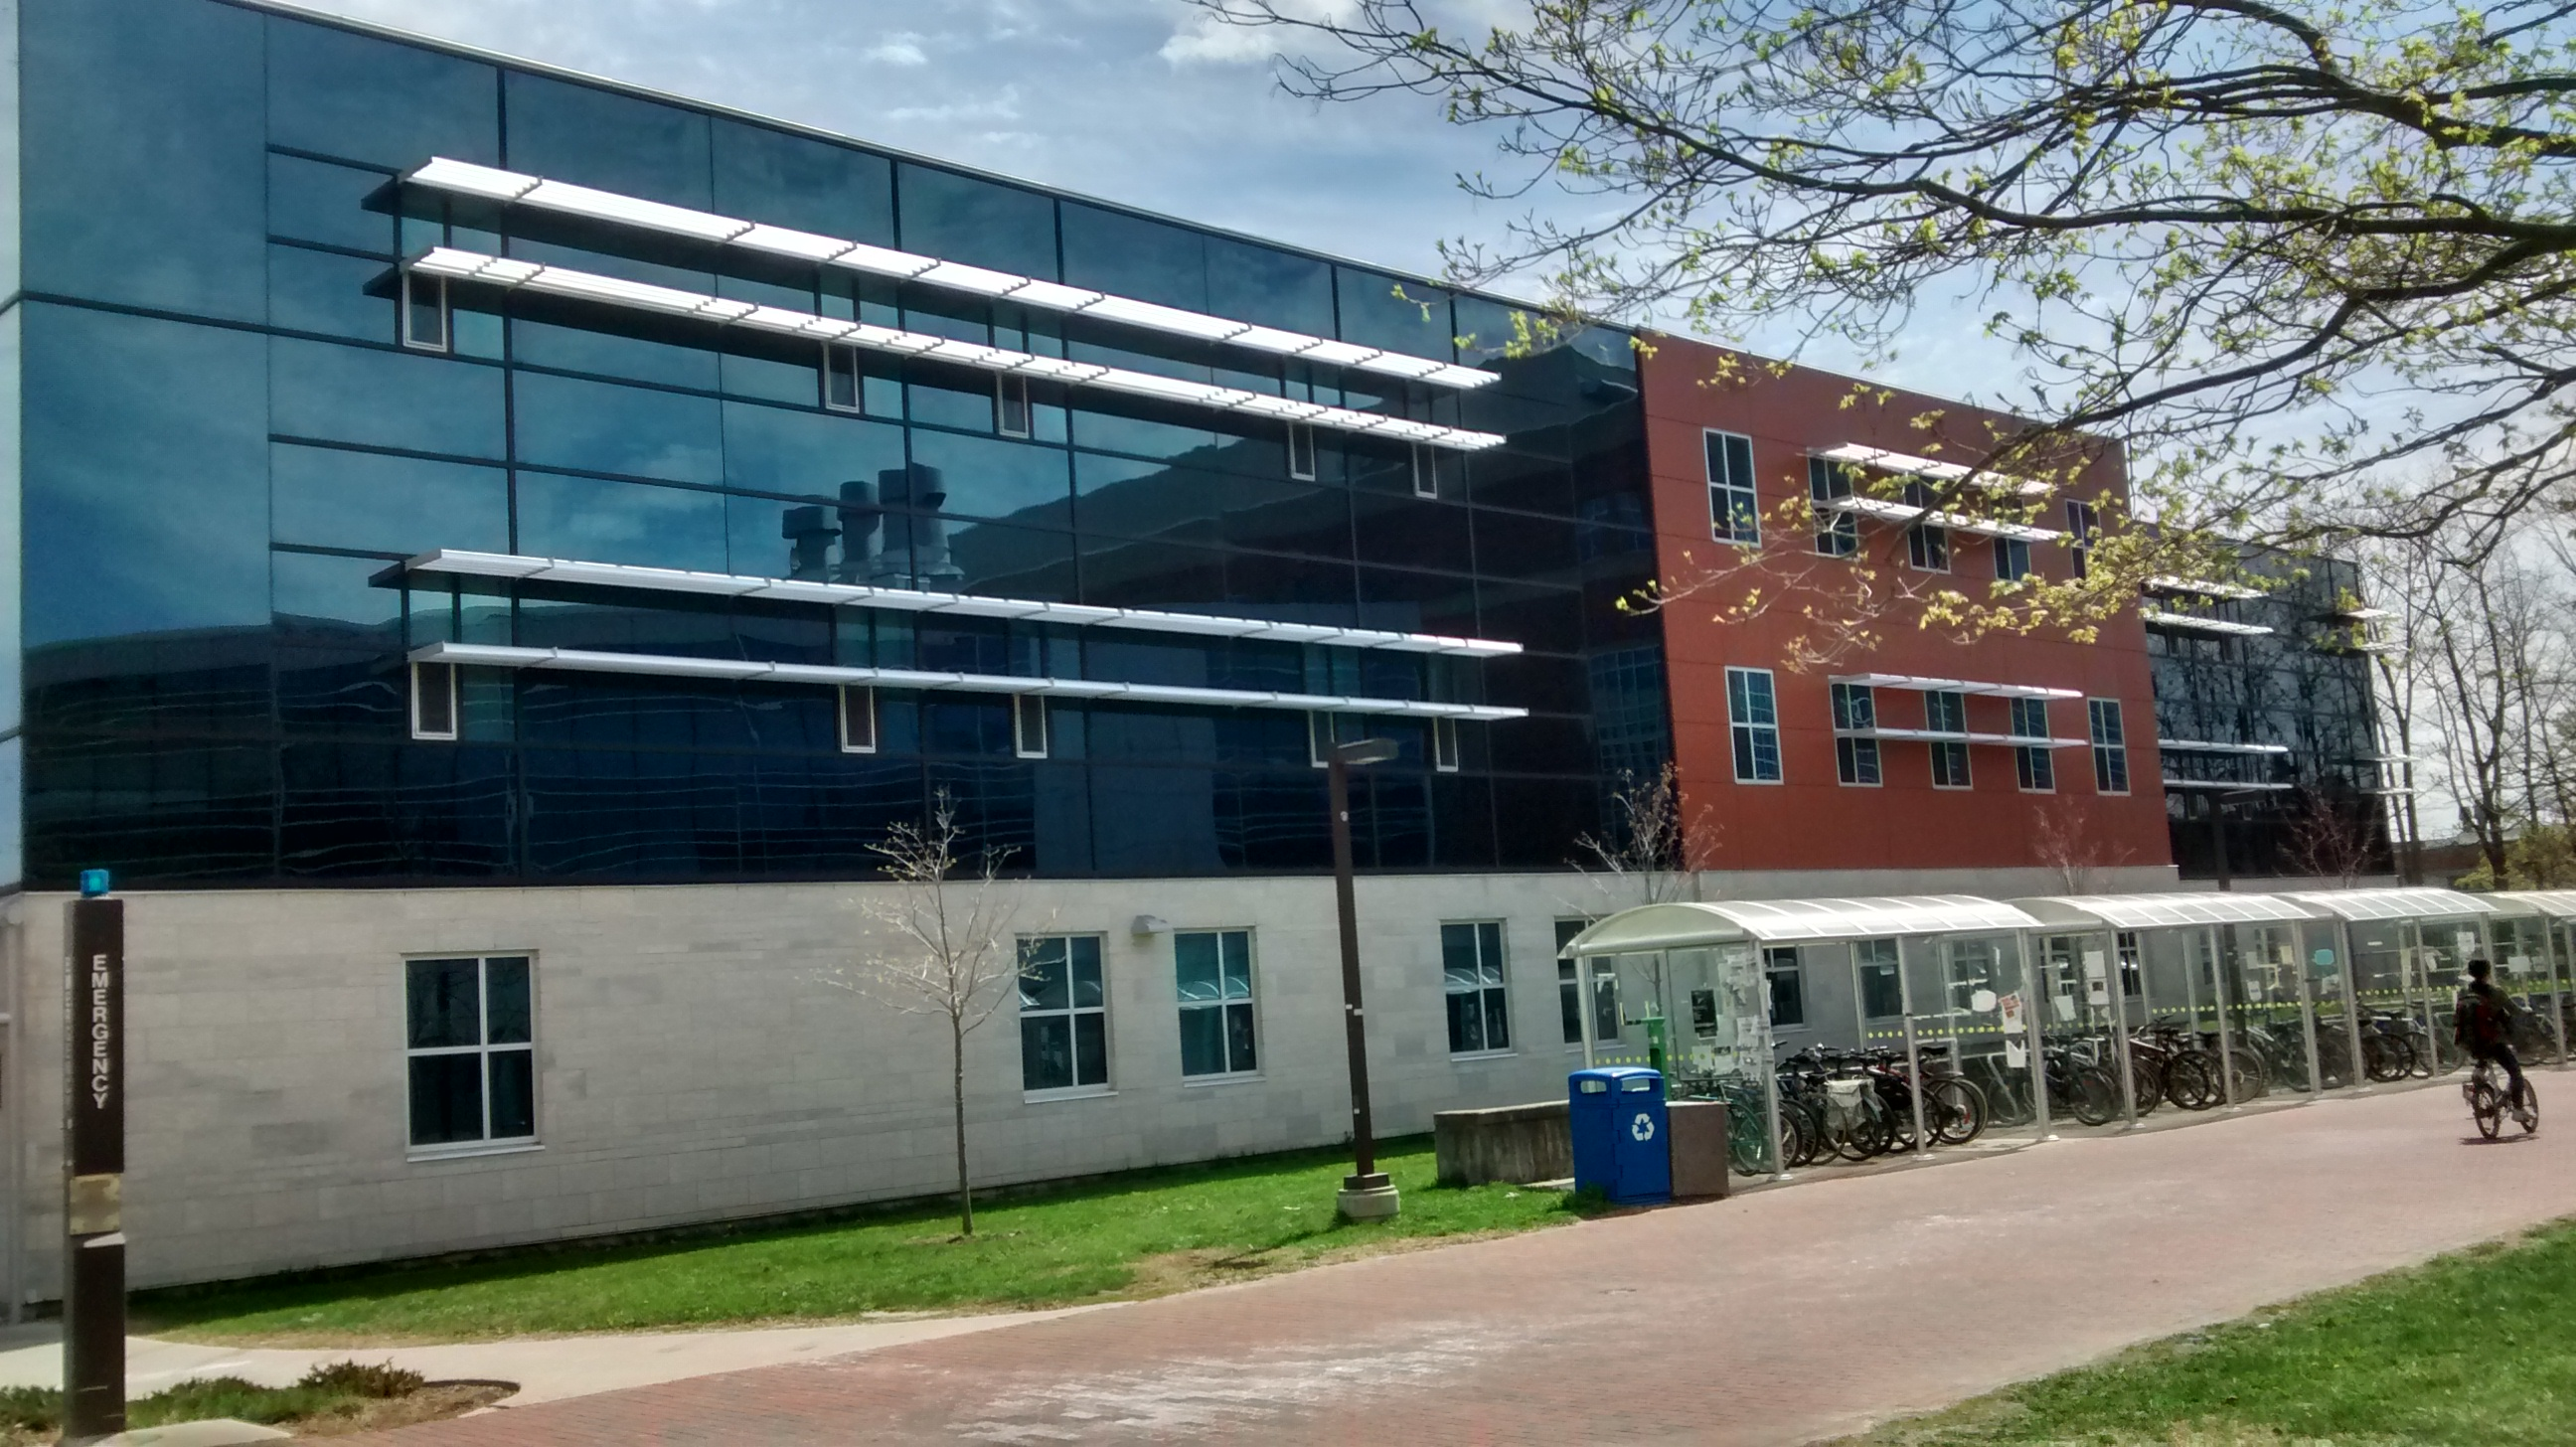 University Of Guelph: File:Alexander Building, University Of Guelph.jpg